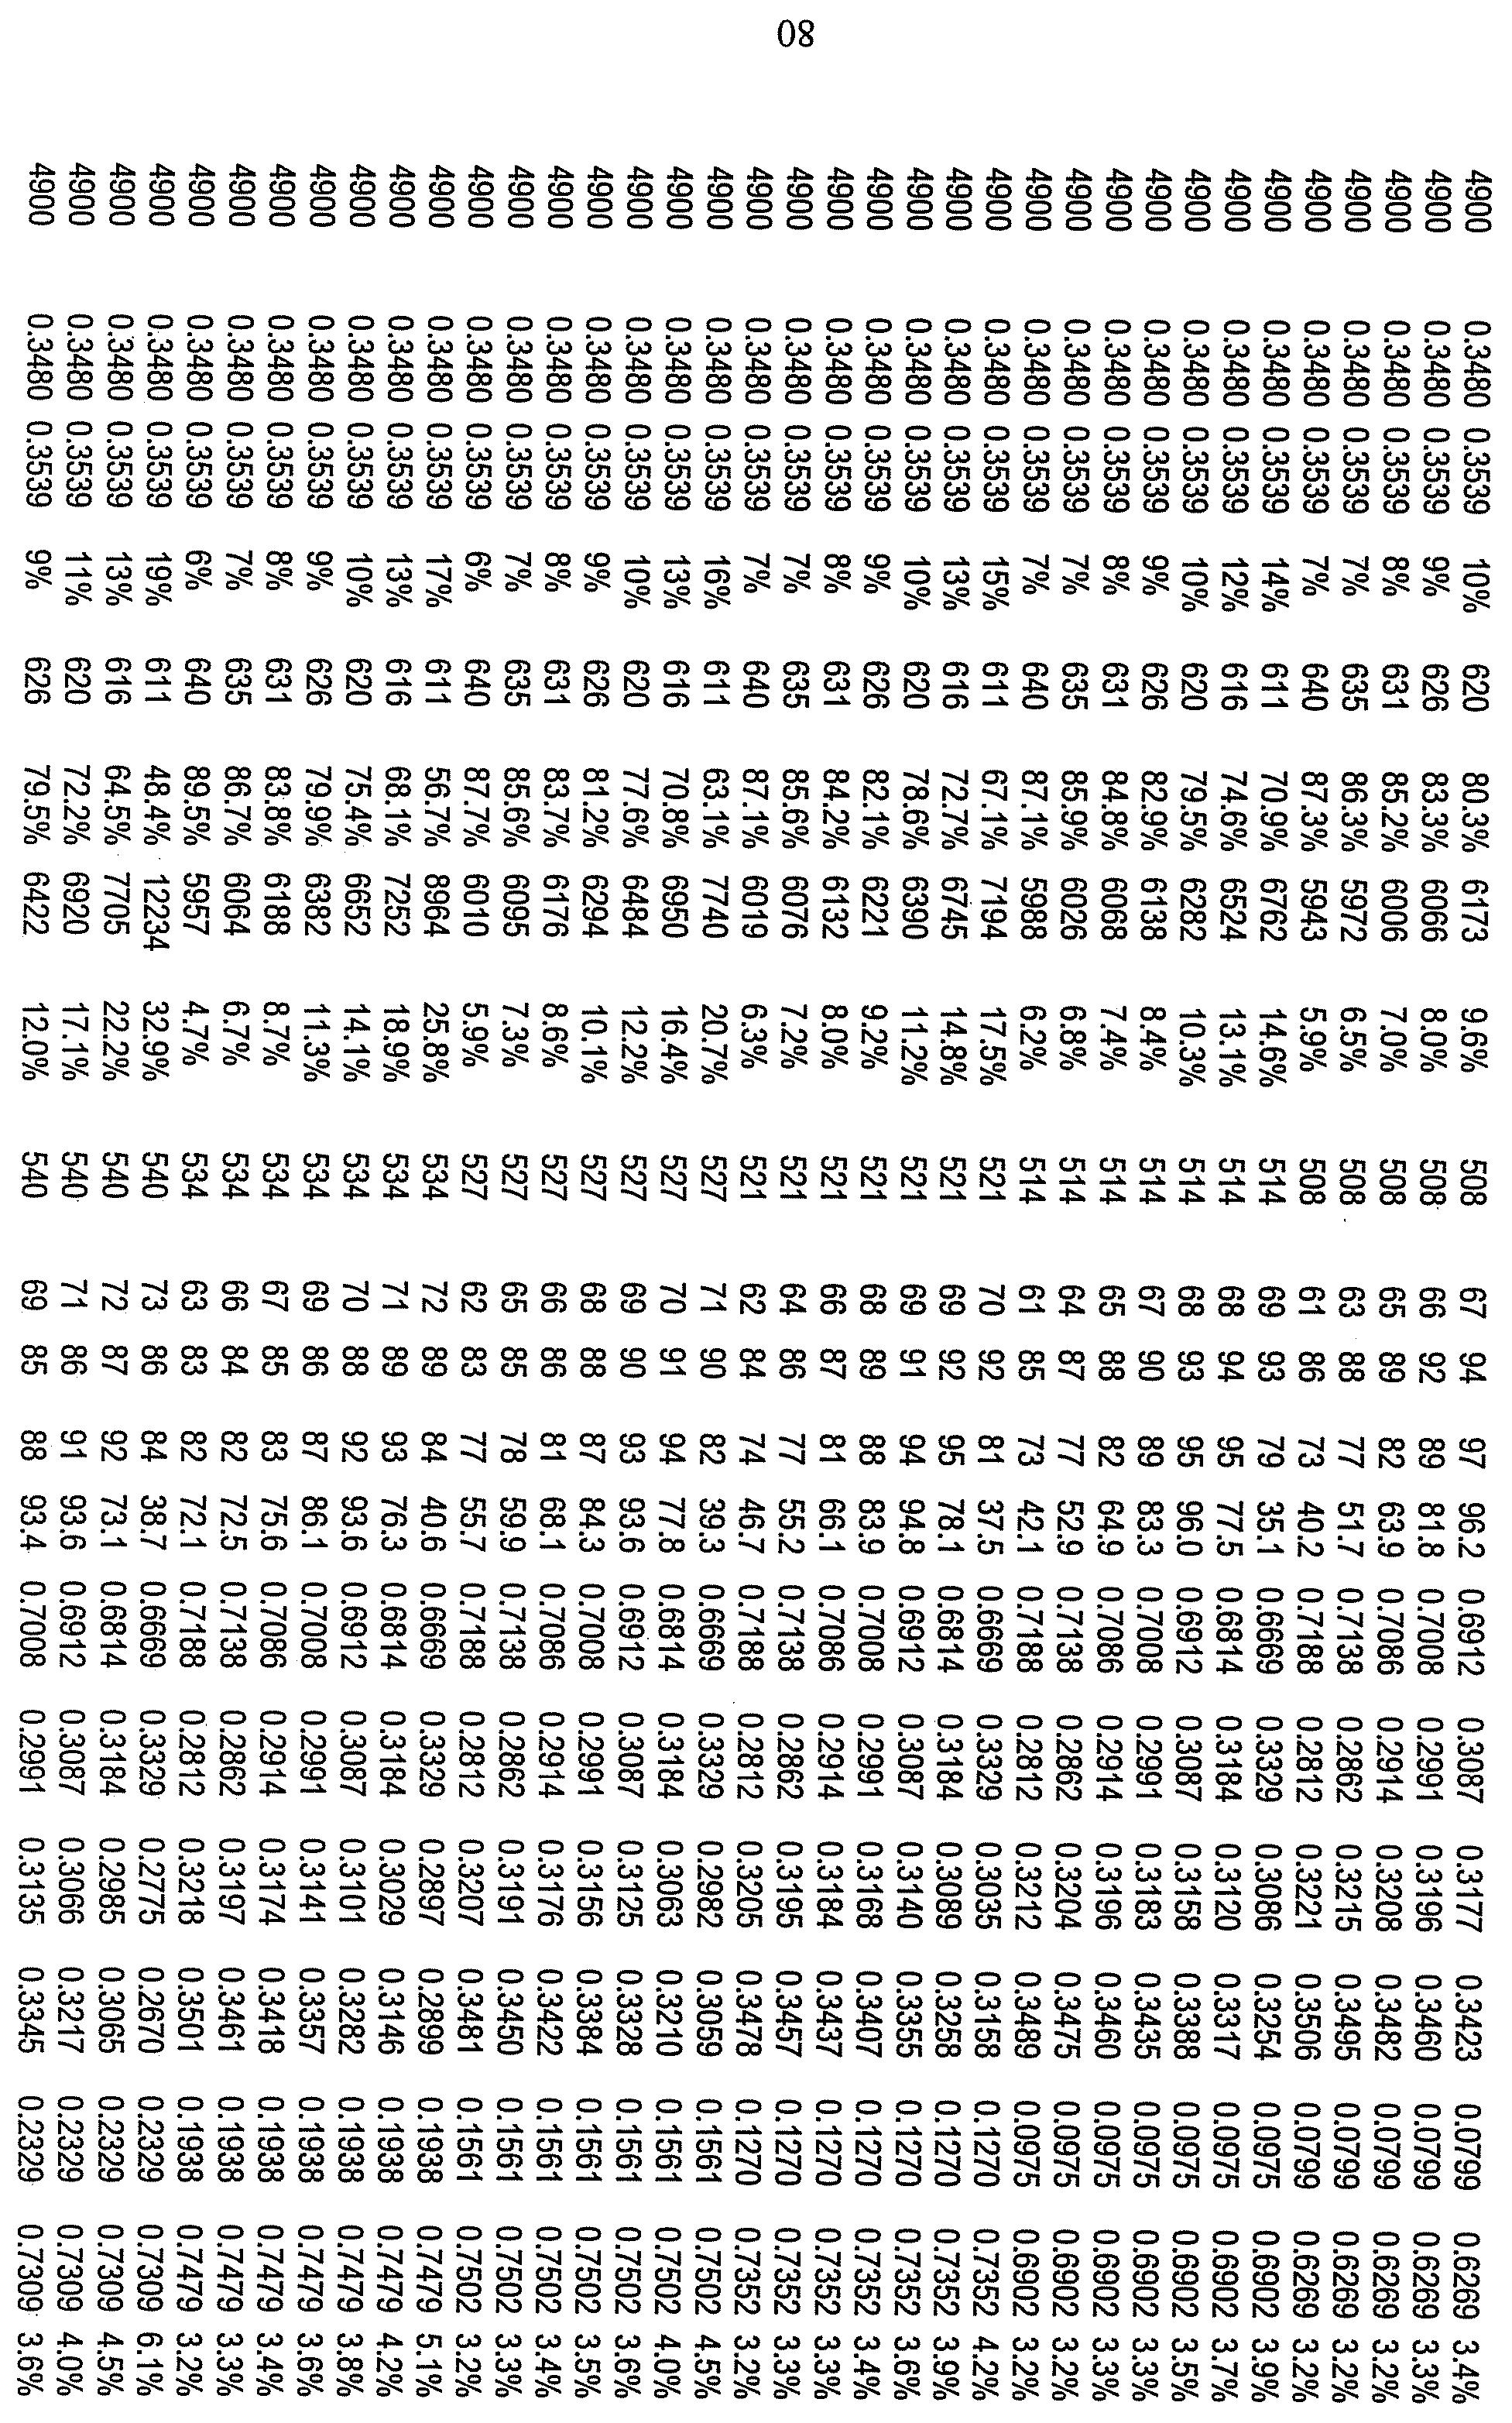 Figure 112010029469117-pct00046